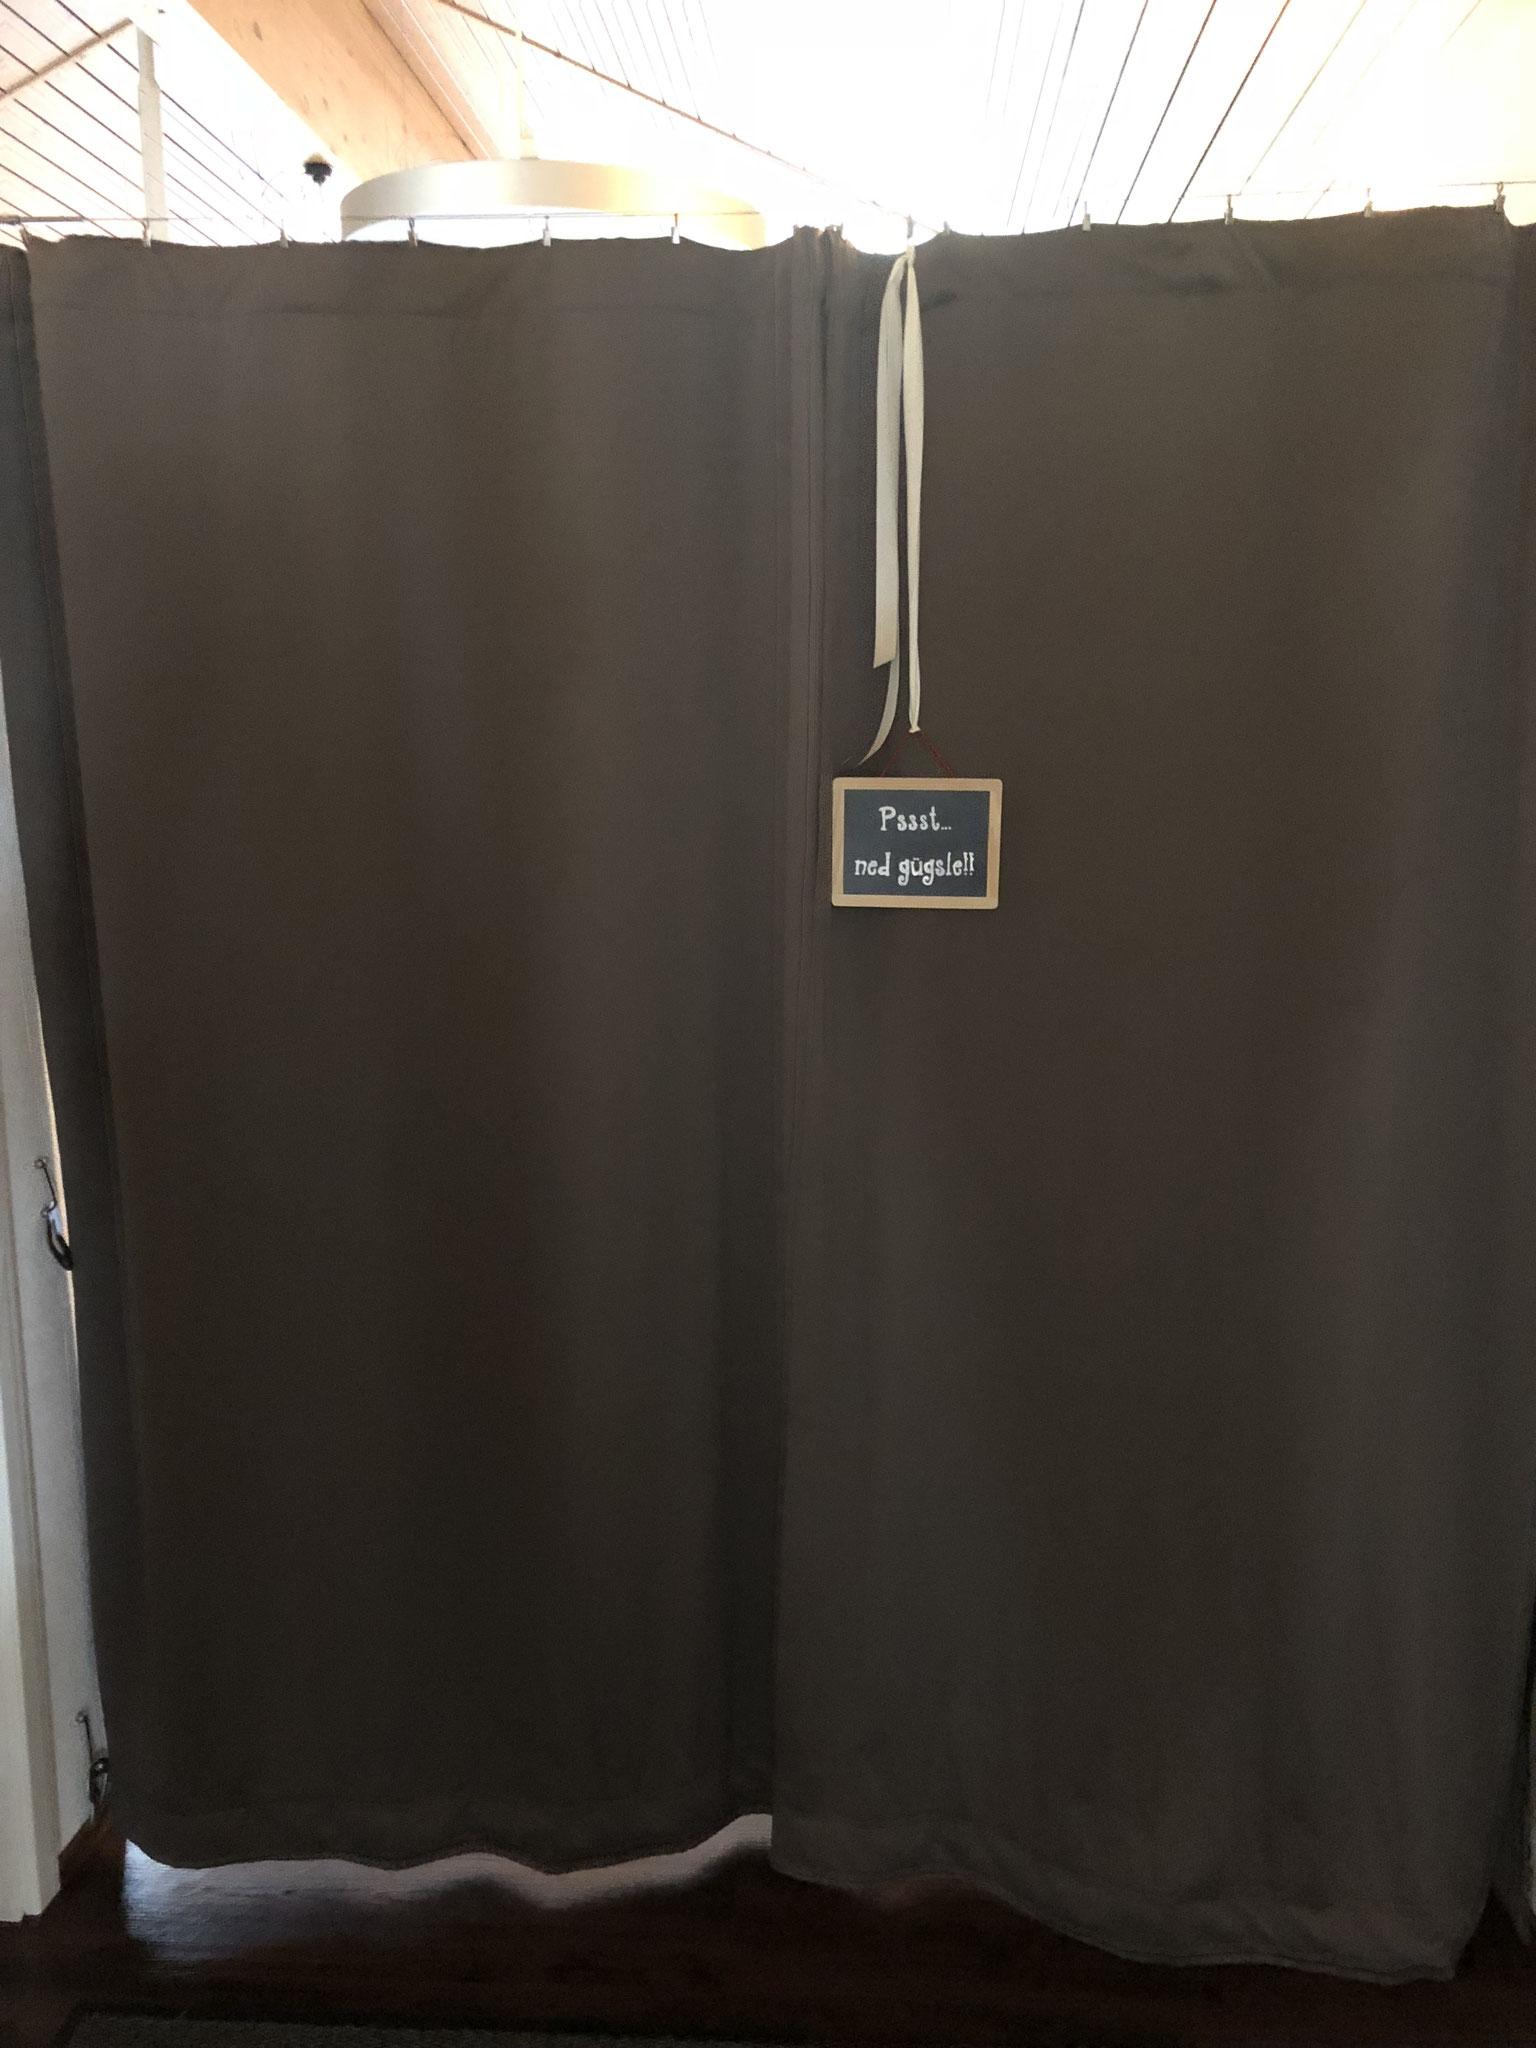 Eingang Eventraum - Garderobe/WC